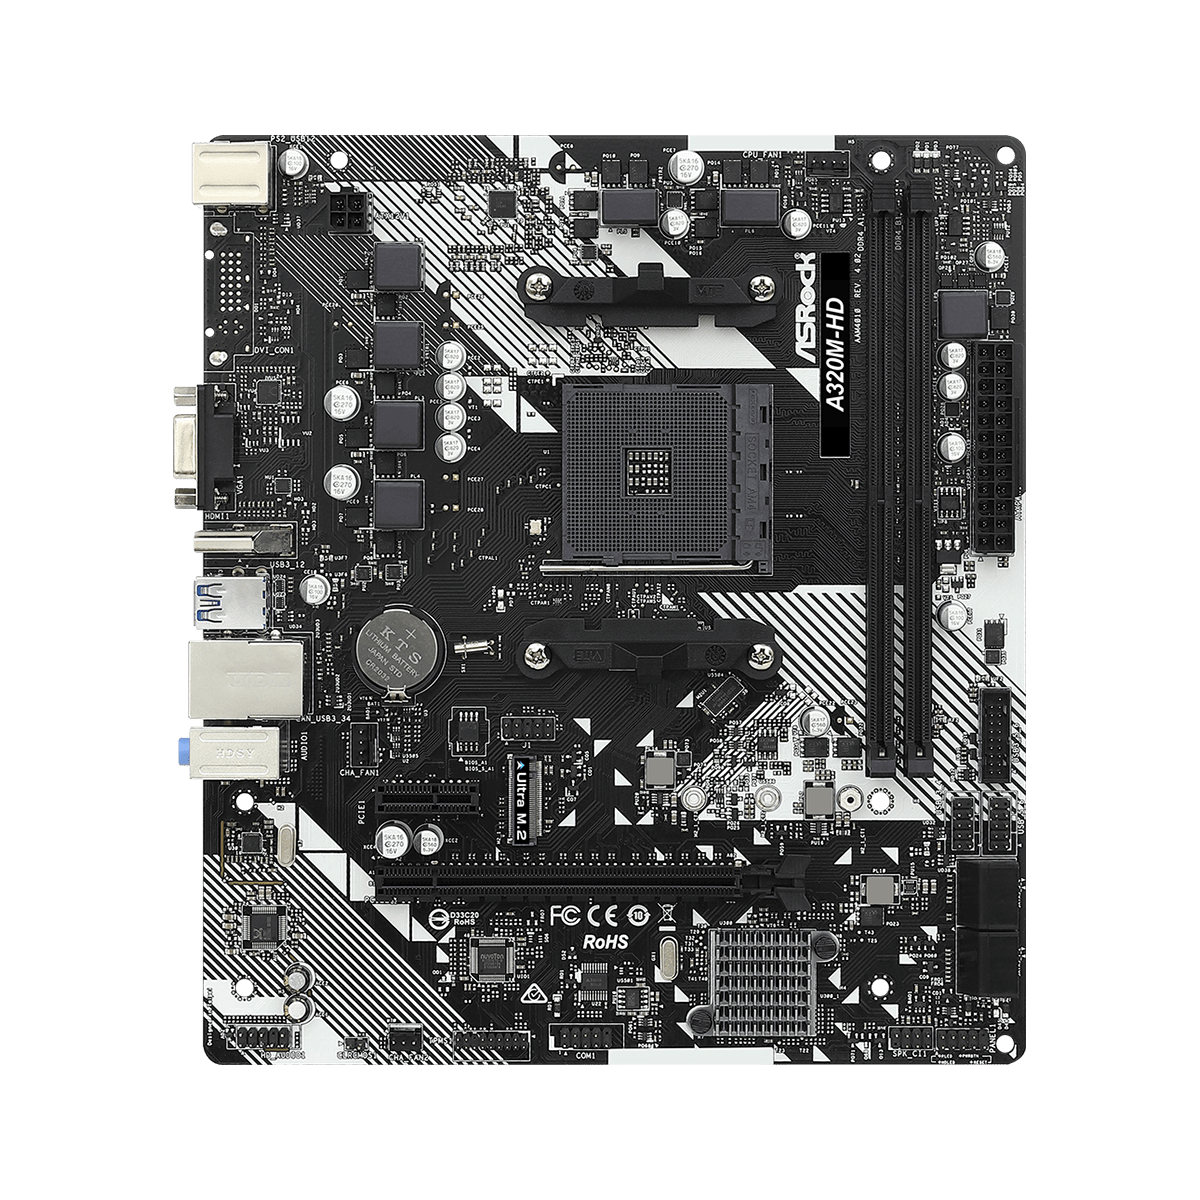 Placa Mãe ASRock A320M-HD R4.0, Chipset A320, AMD AM4, mATX, DDR4